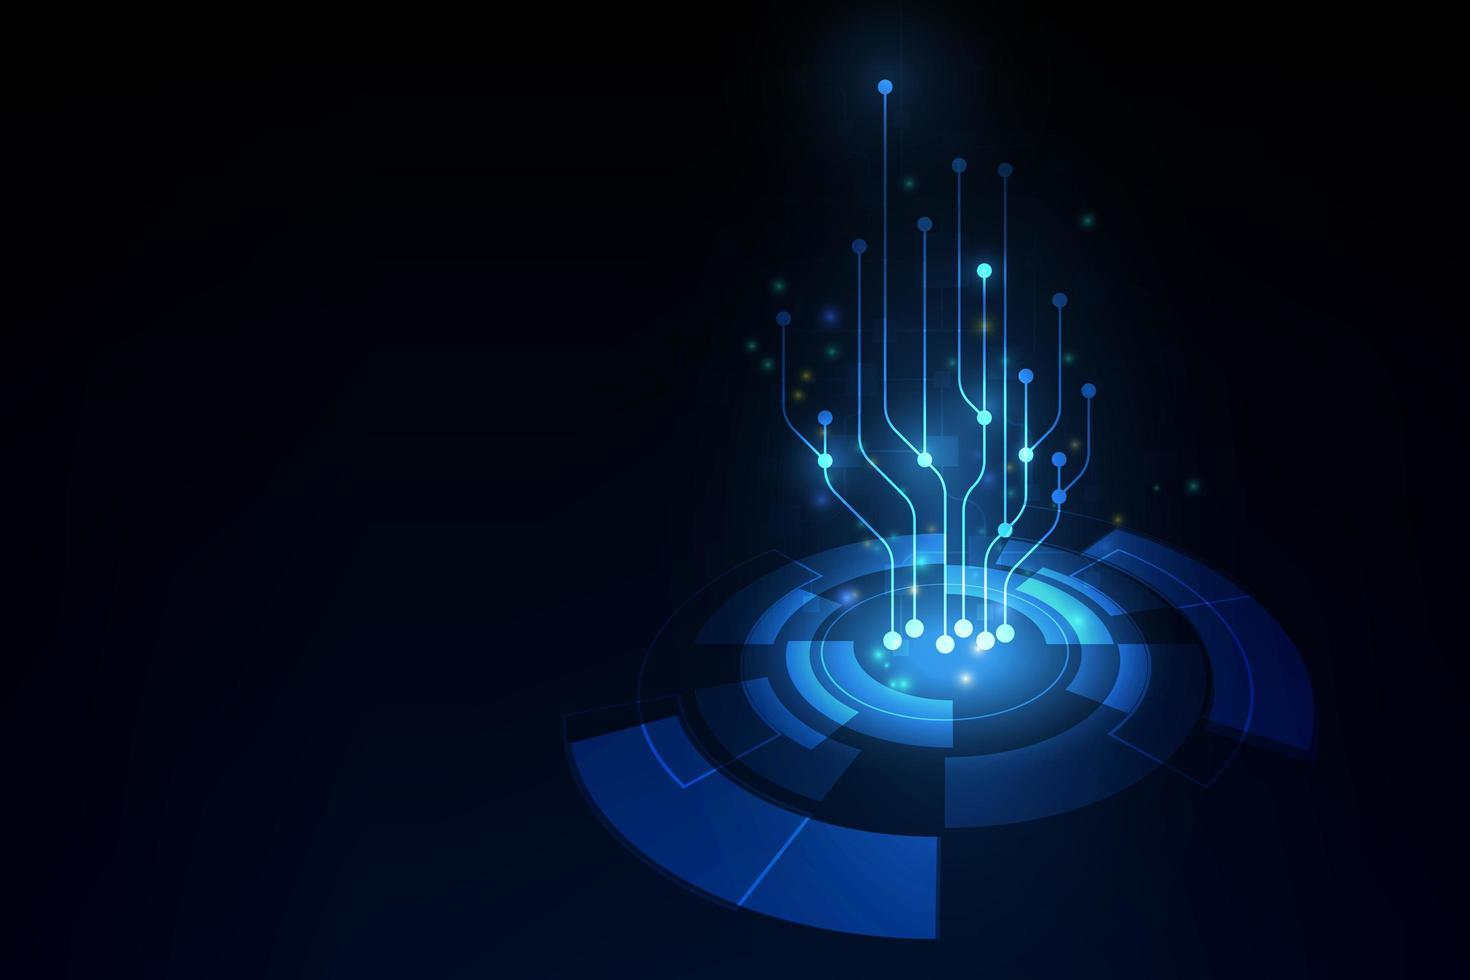 fundo abstrato com placa de circuito azul de alta tecnologia vetor